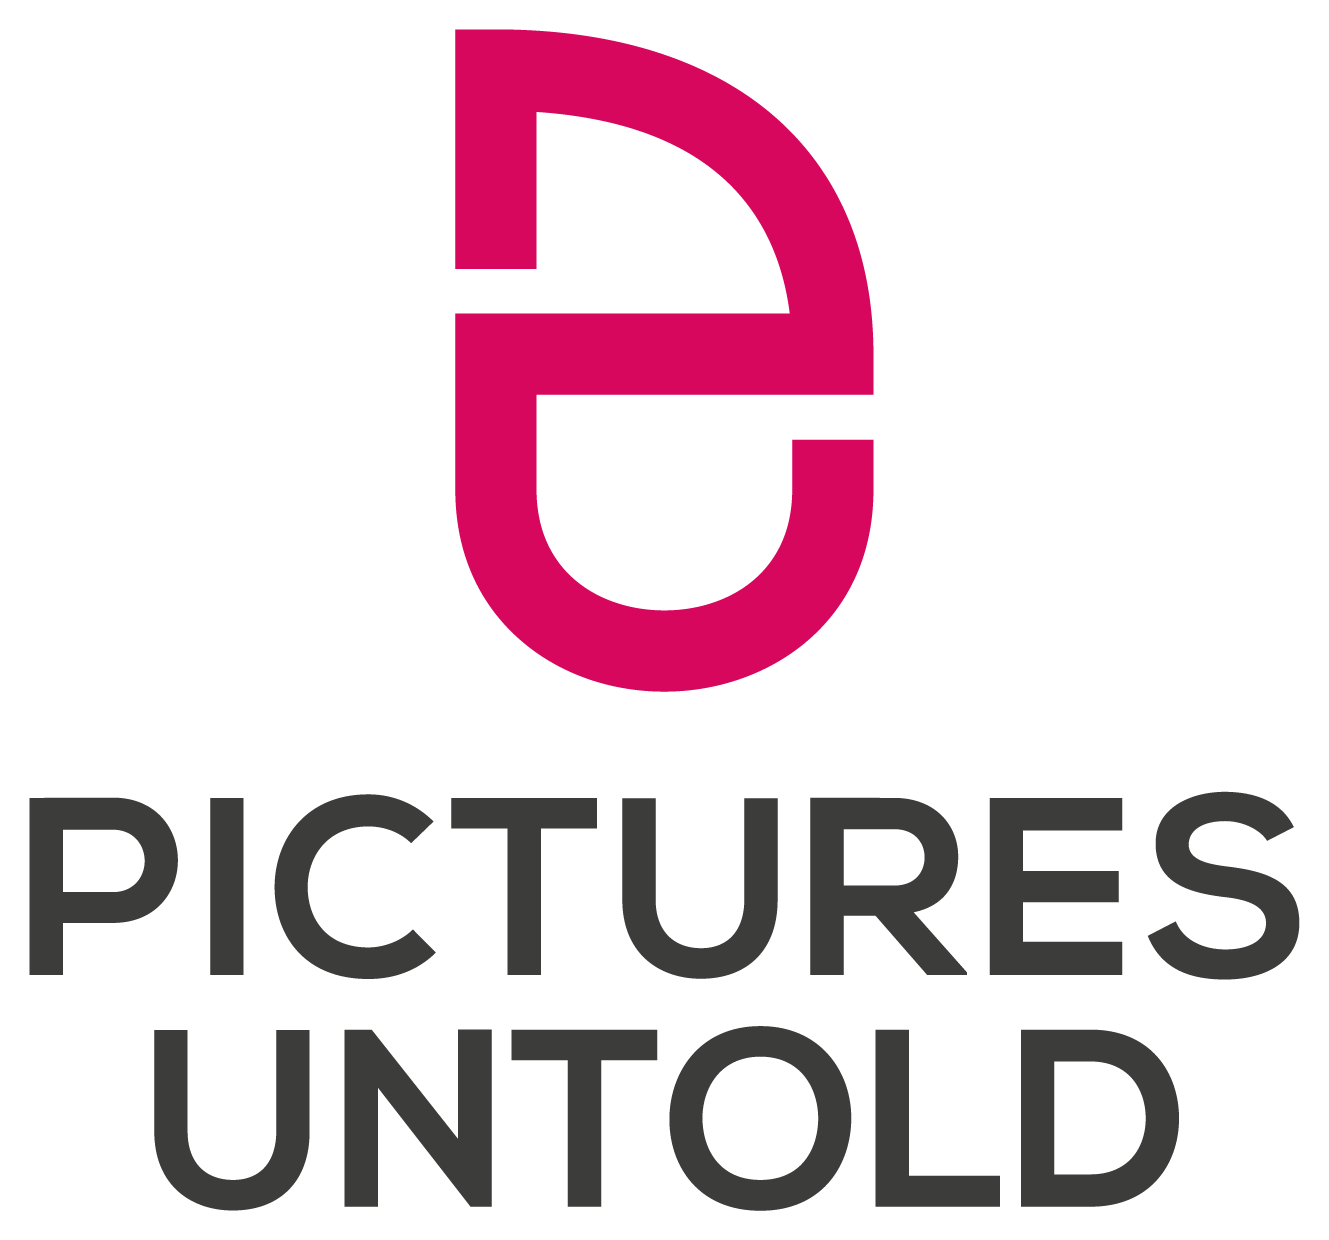 Pictures Untold